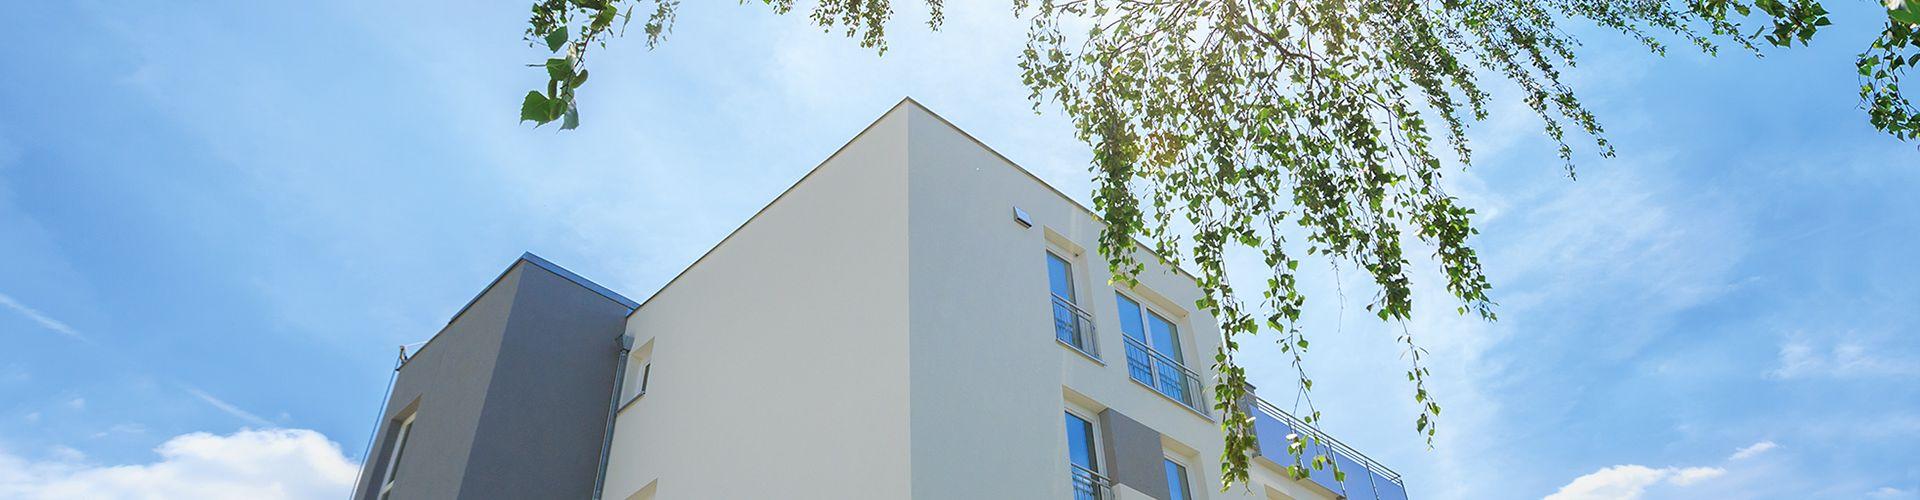 Doppelhaushälften Rednitzhembach, Schwander Straße